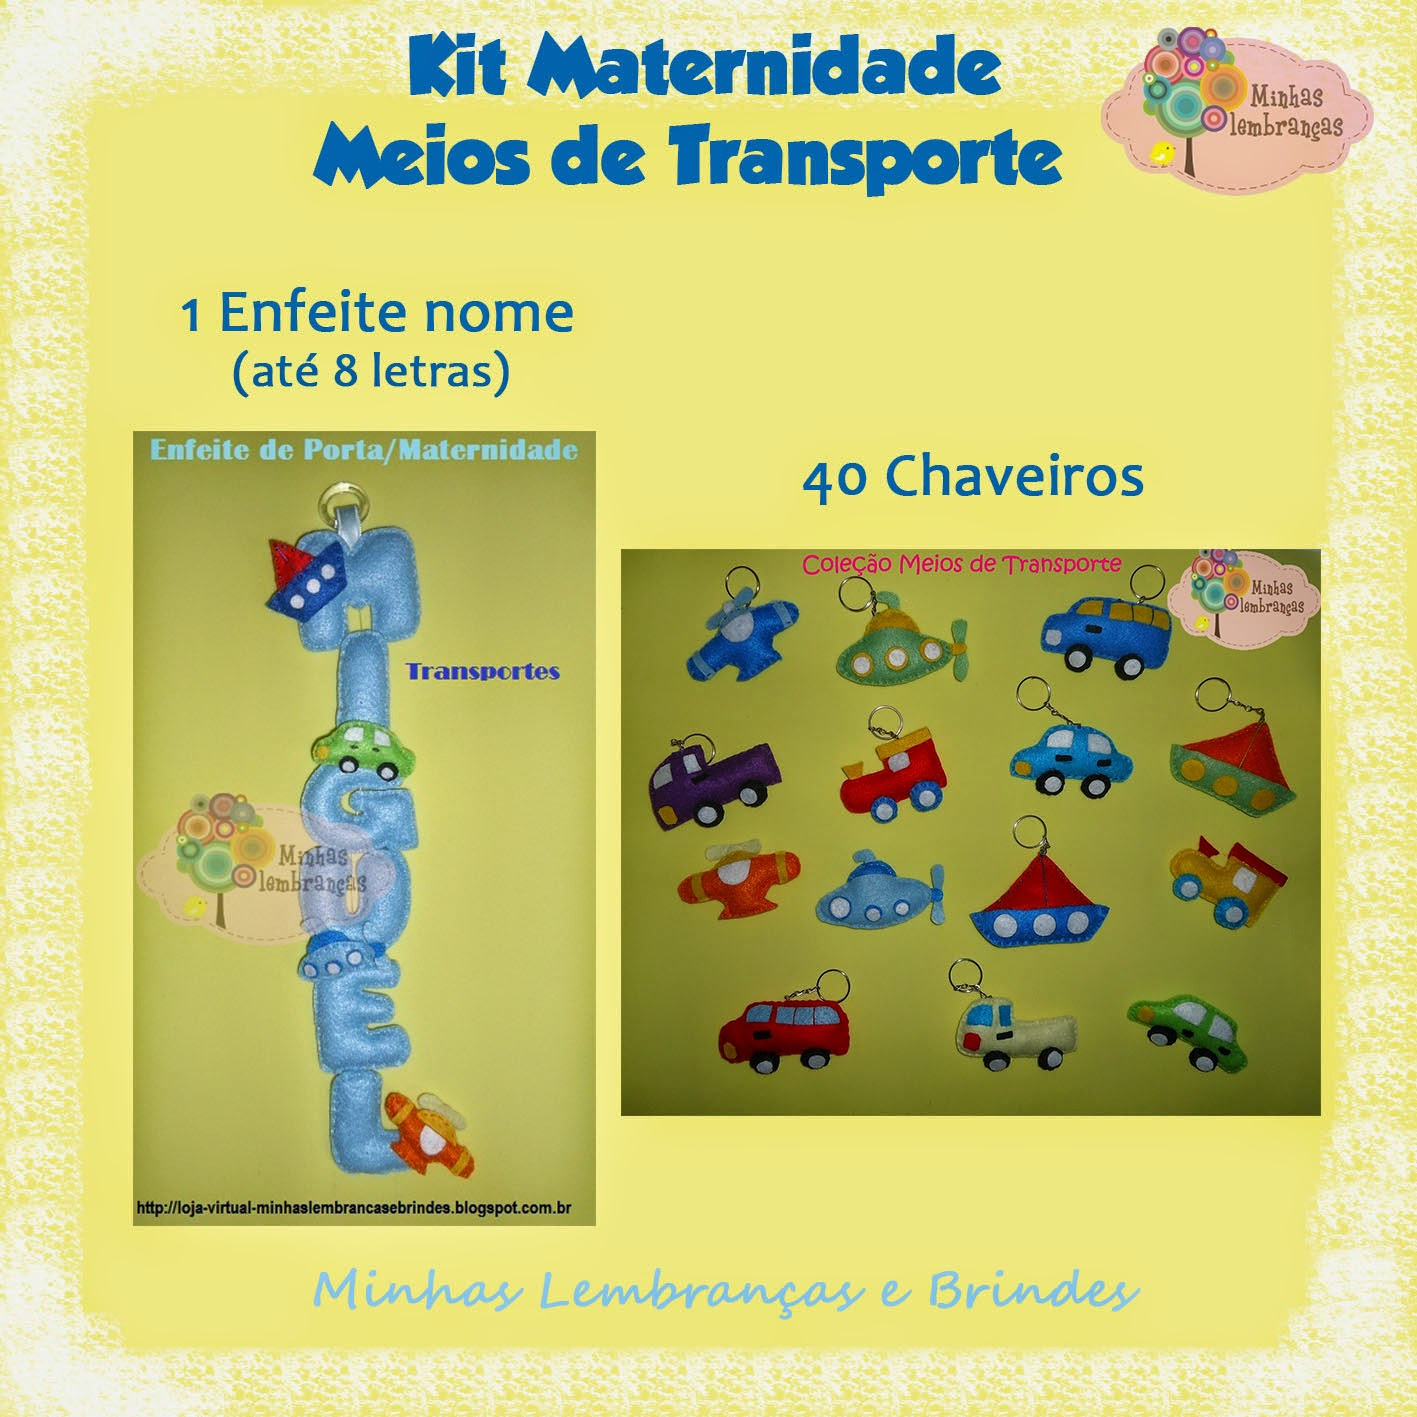 meios de transporte-feltro-maternidade-kit-enfeite-porta-nome-nascimento-bebê